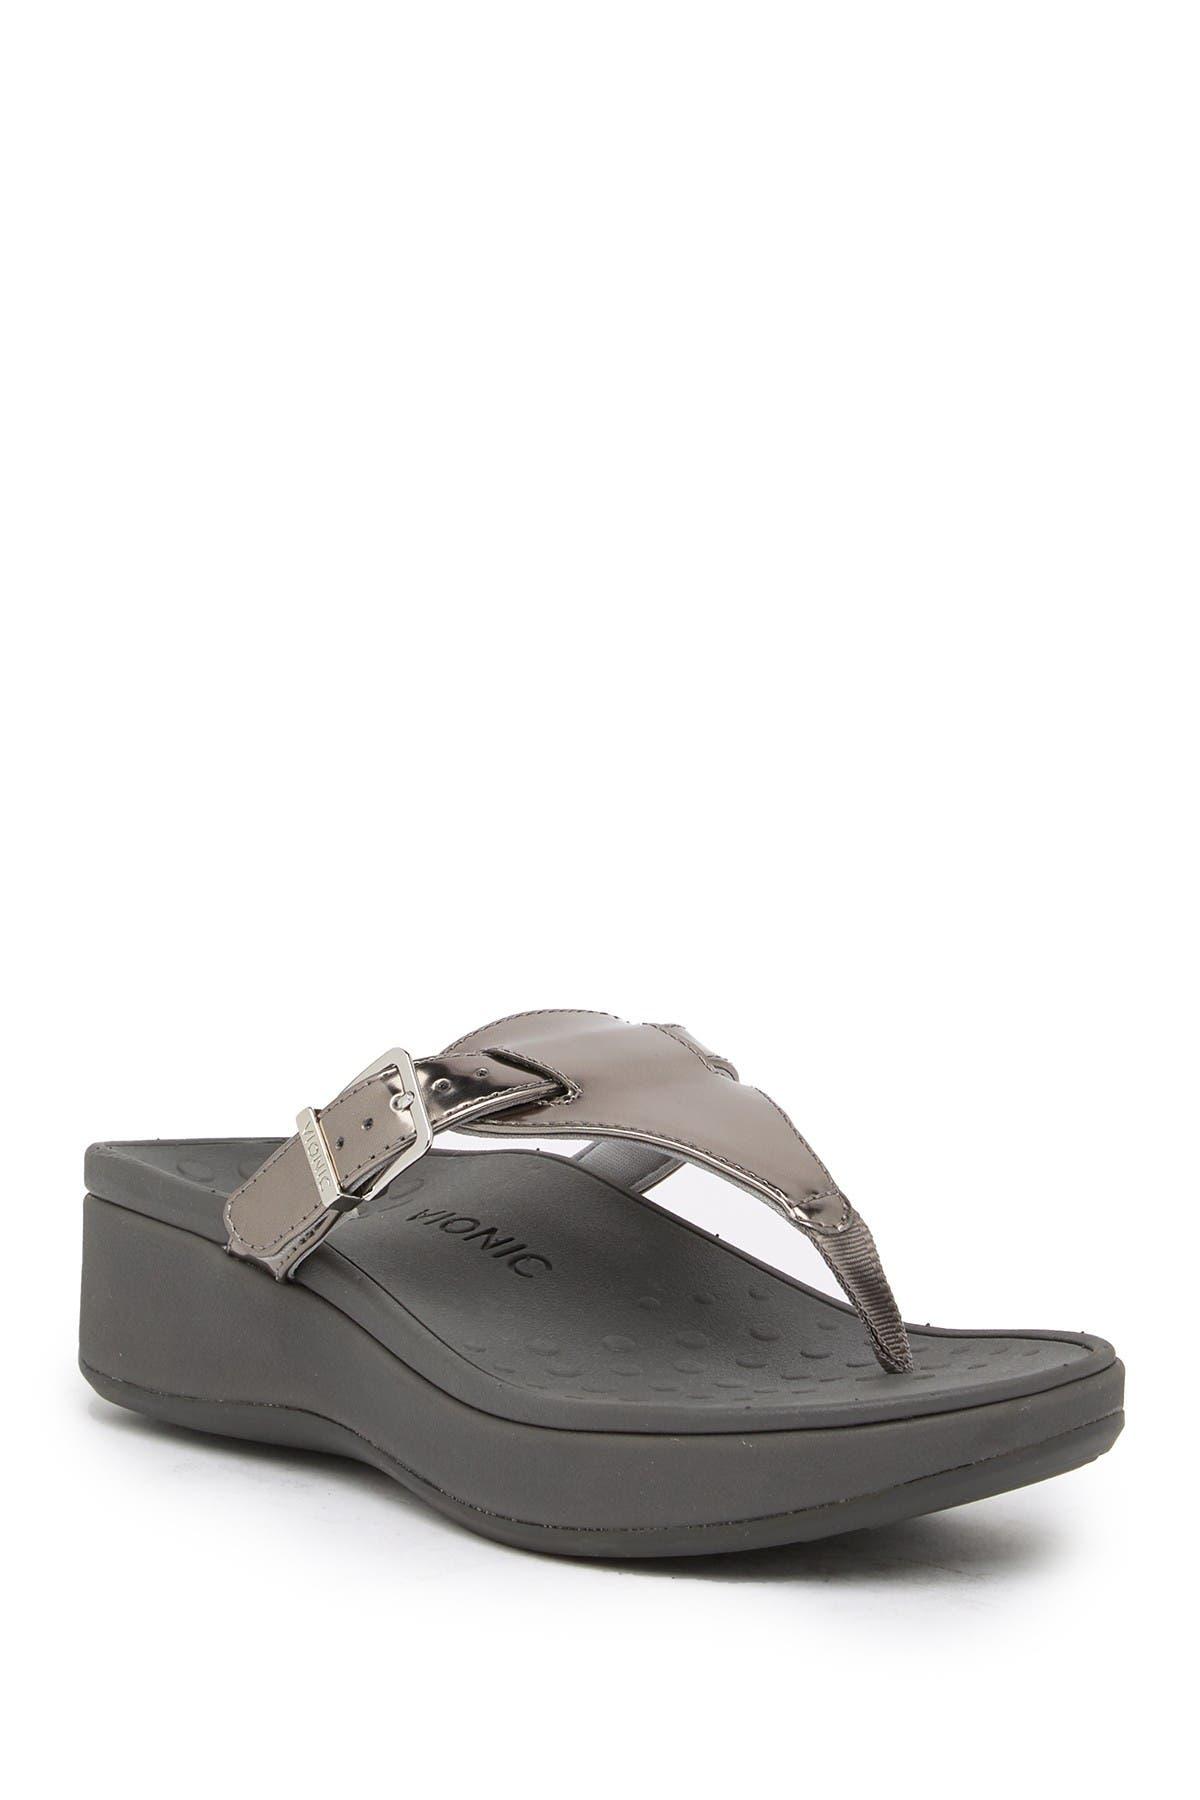 Image of Vionic Cooper Wedge Sandal